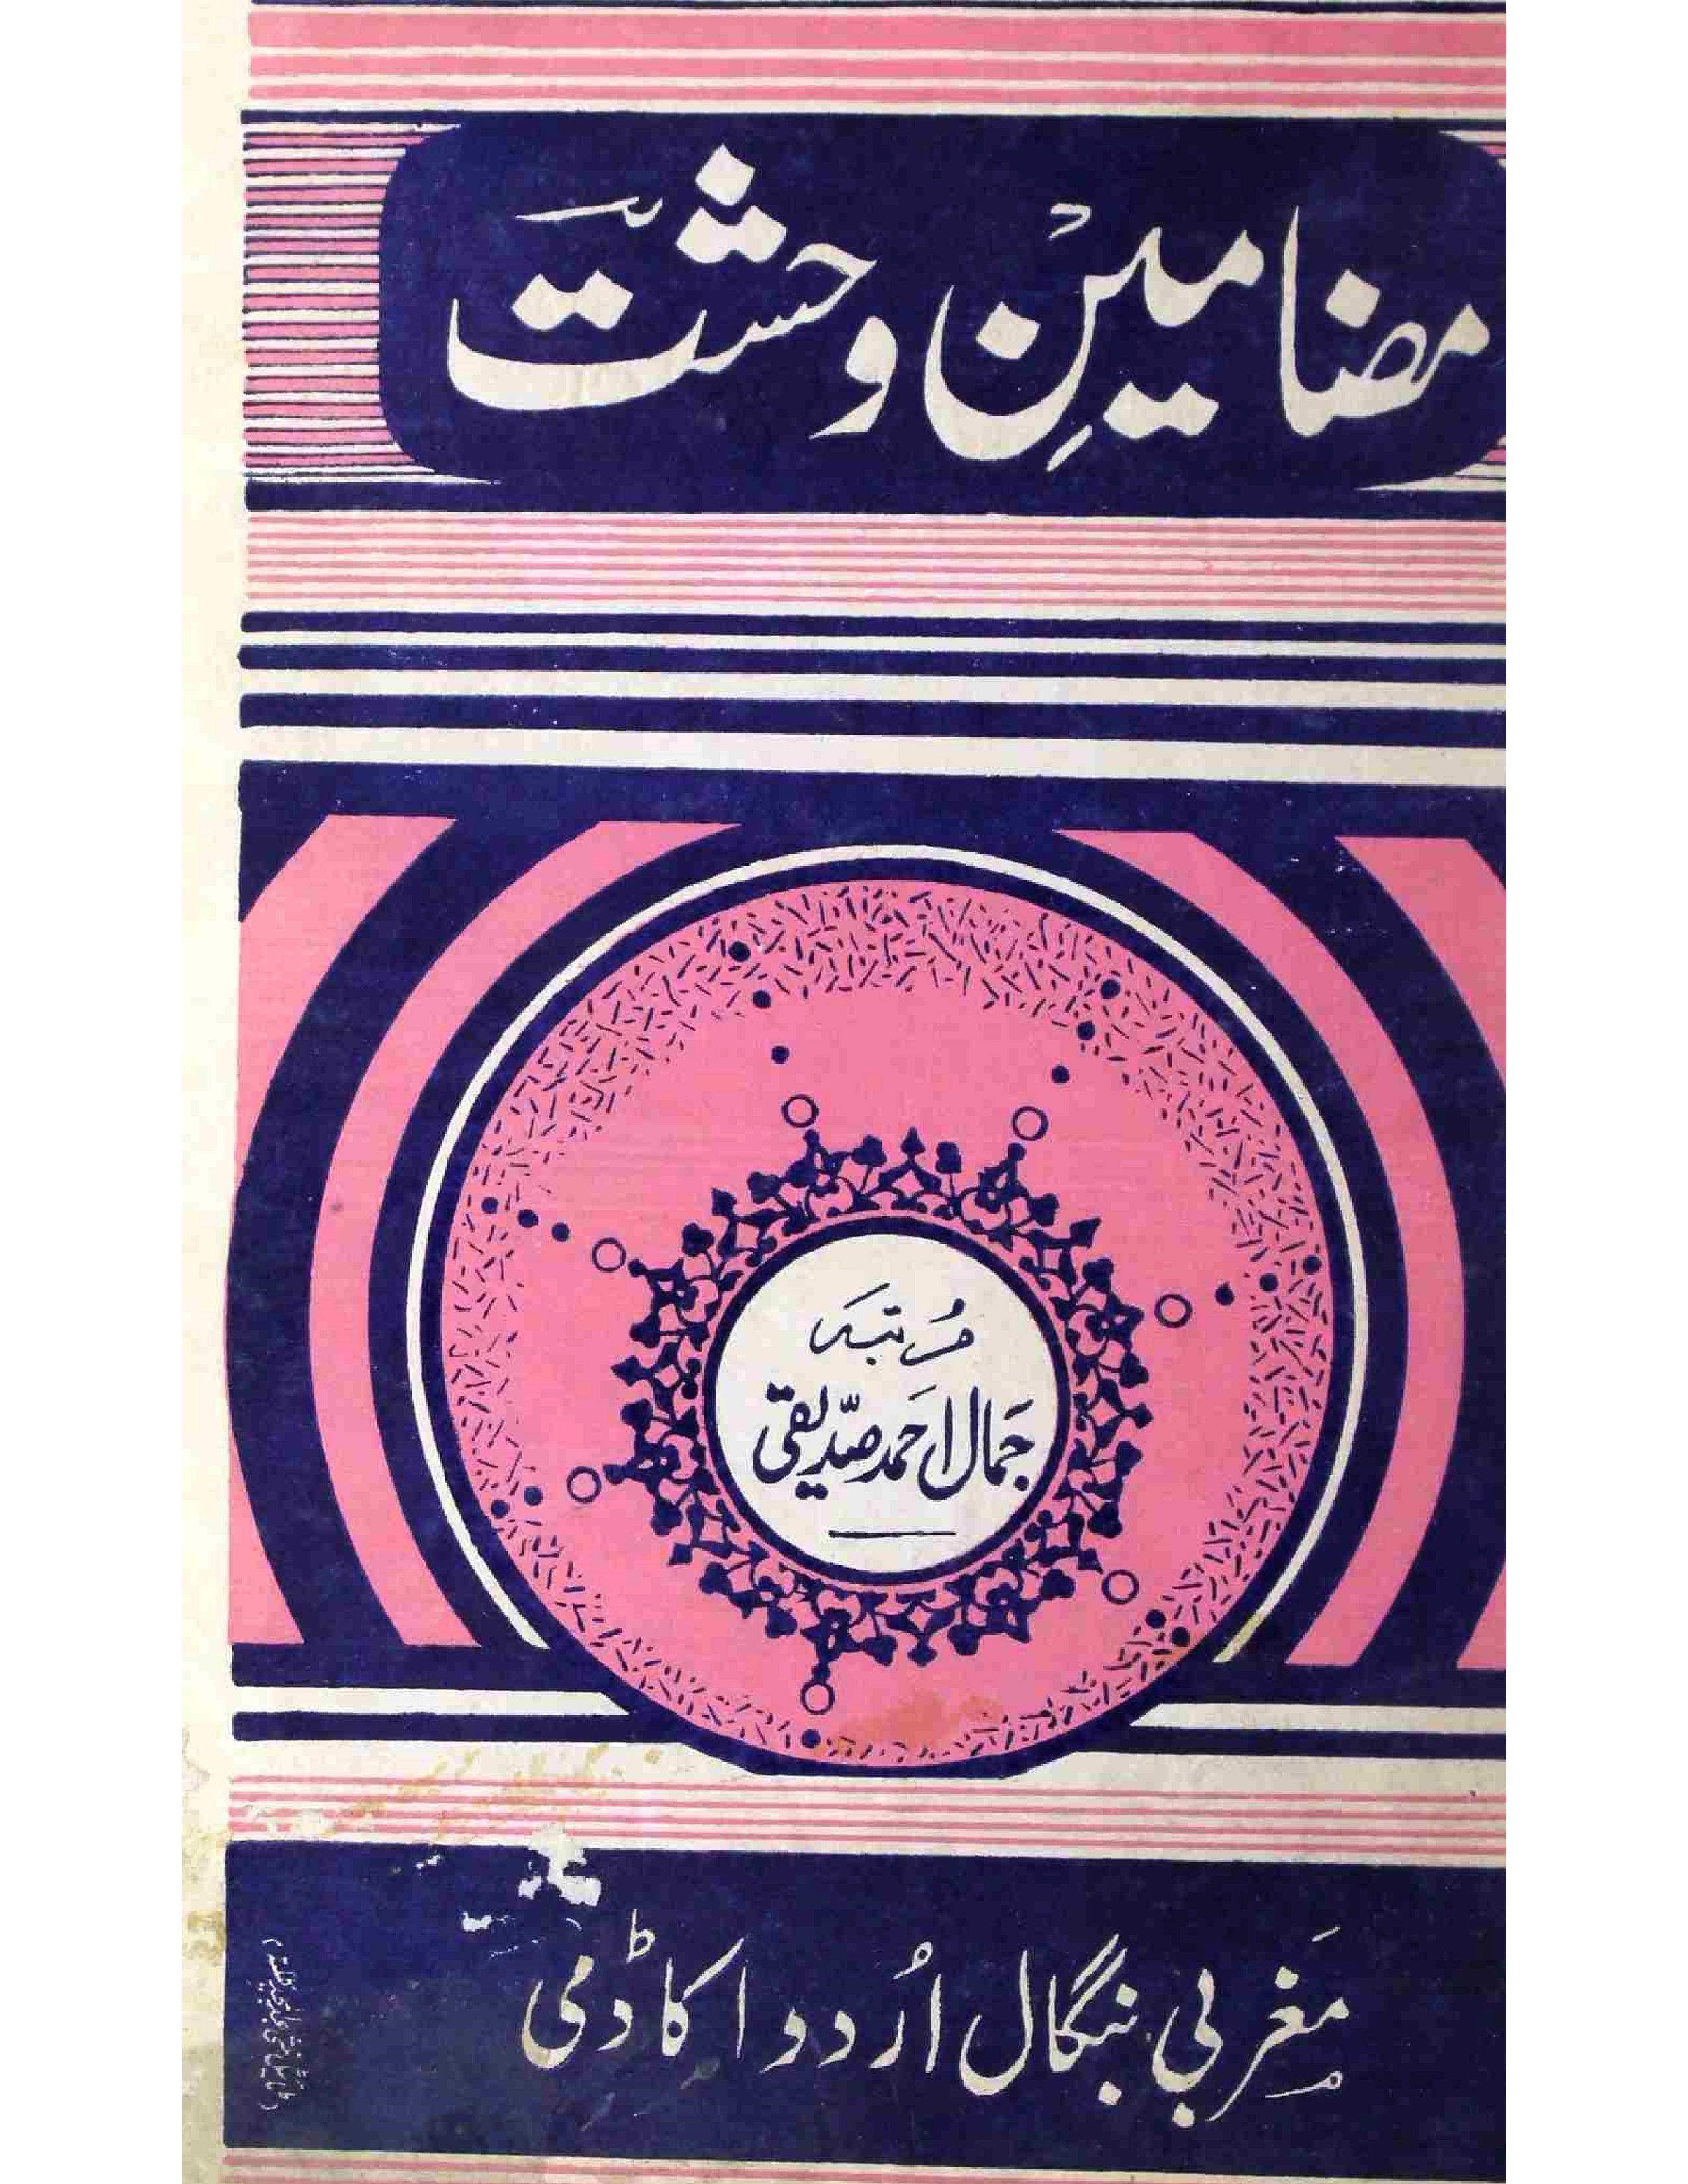 Mazameen-e-Wahshat